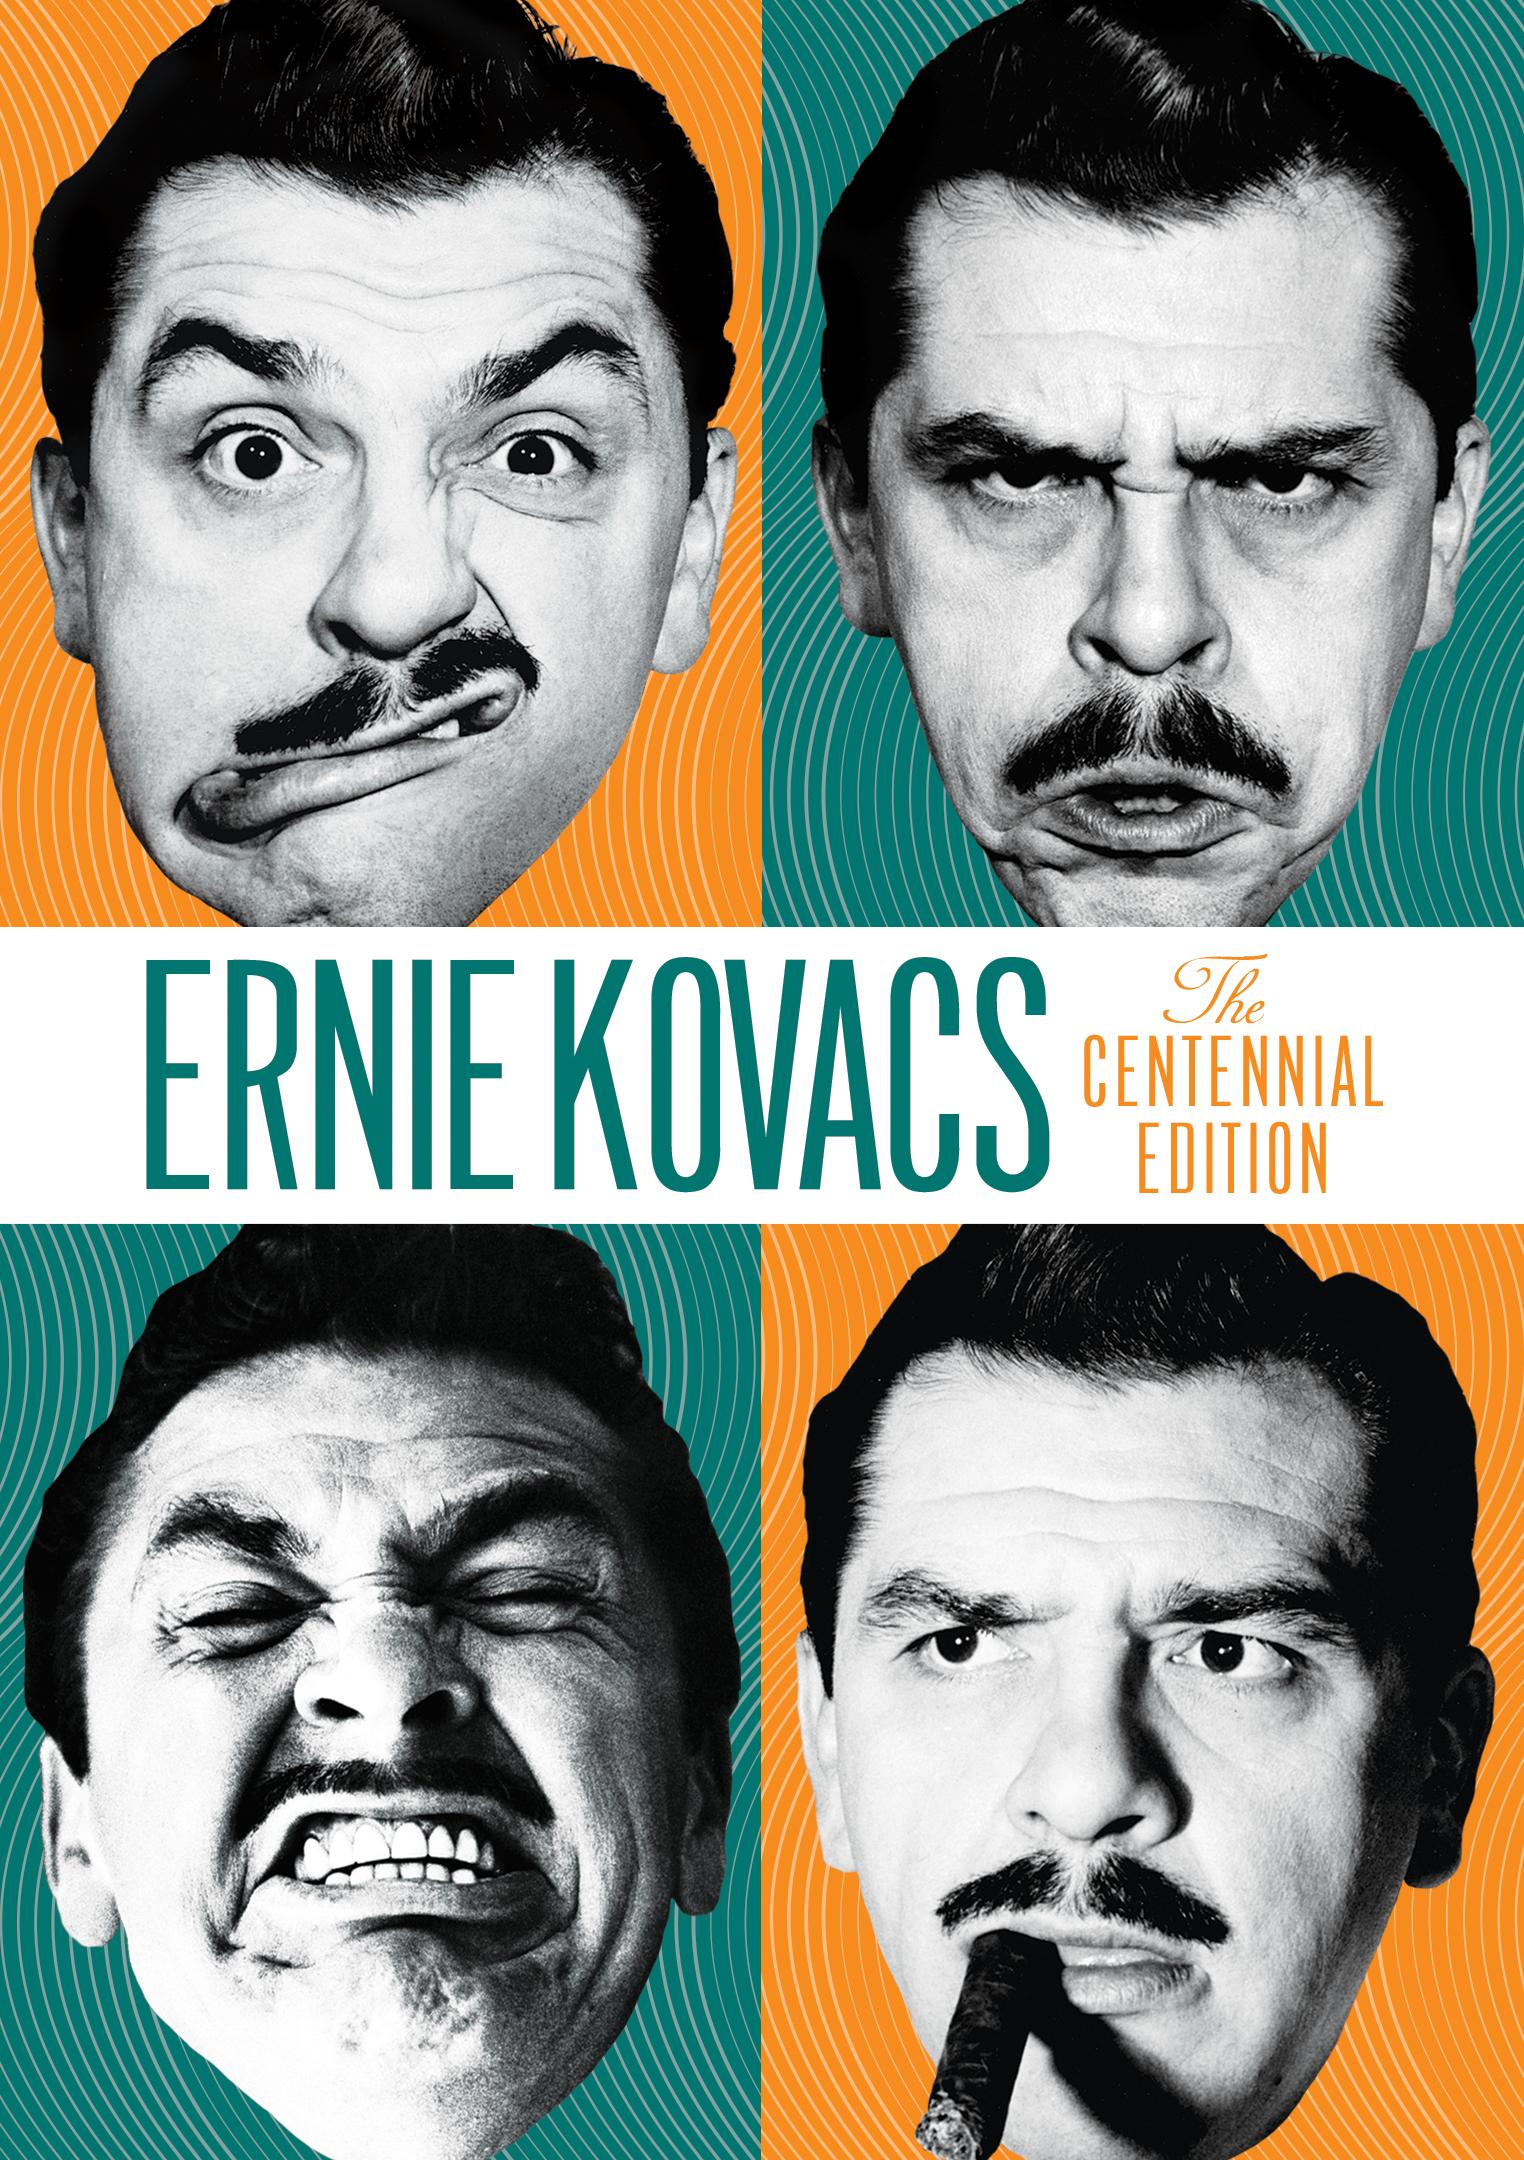 Ernie Kovacs Centennial News + New DVD Box Set and Ltd. Ed. Lithographs!